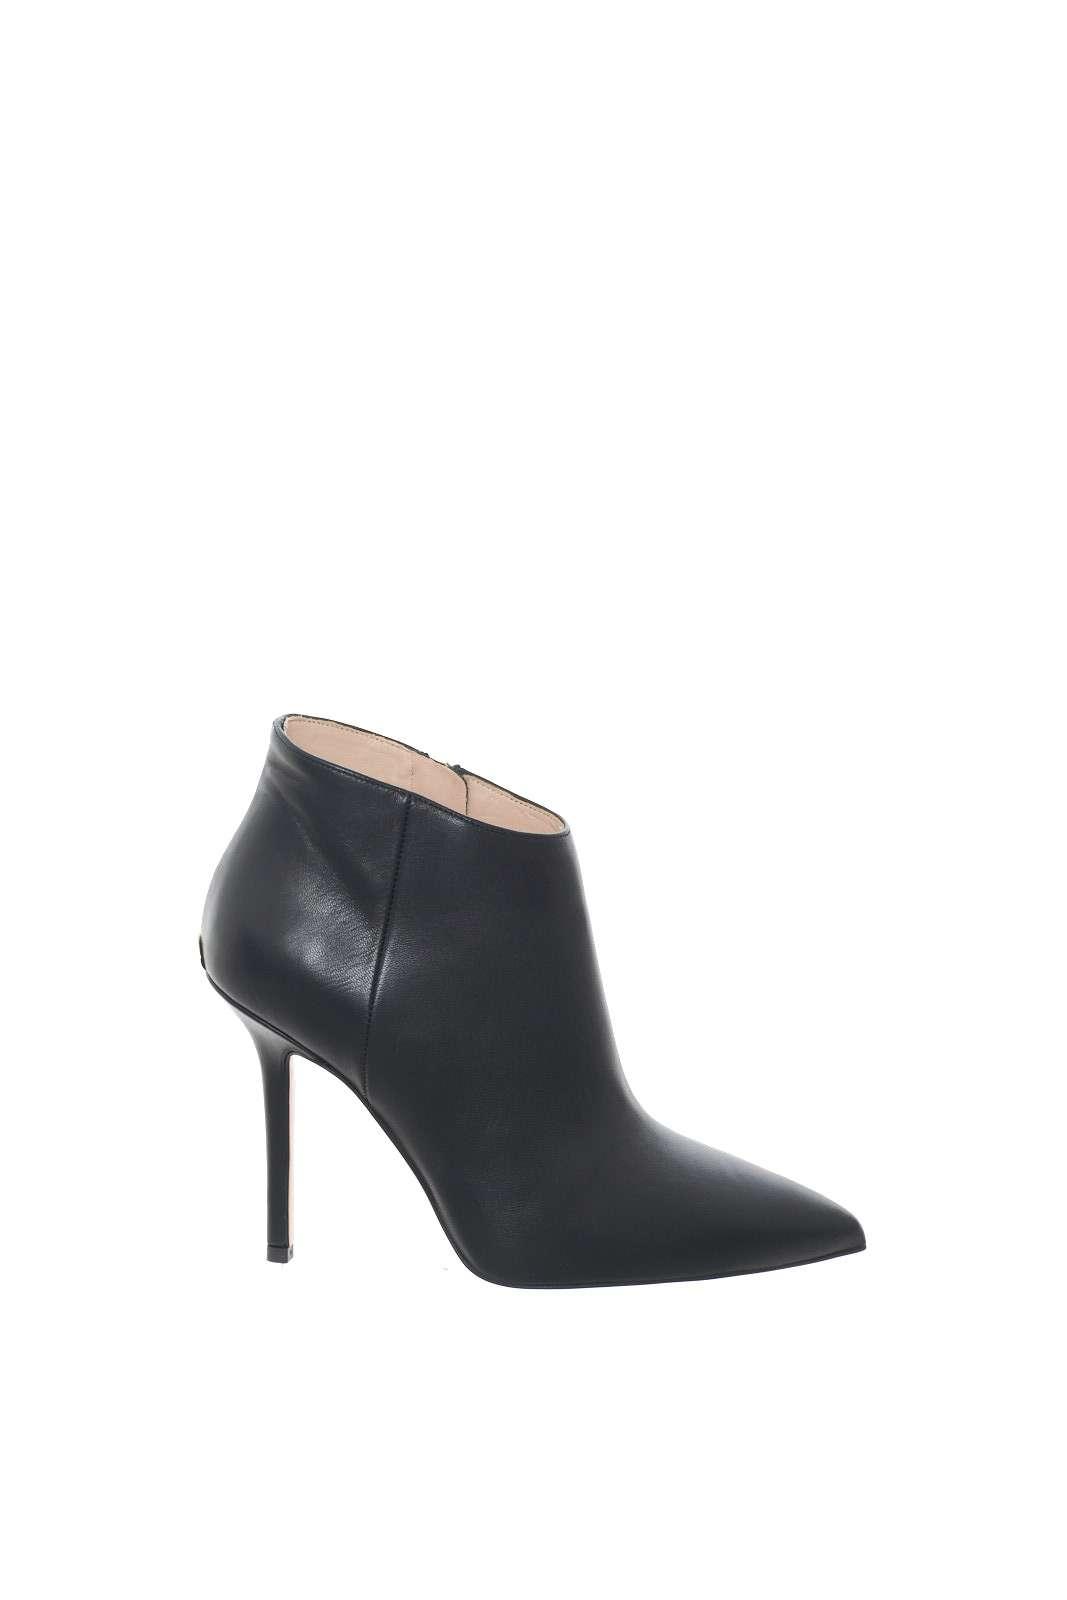 https://www.parmax.com/media/catalog/product/a/i/AI-outlet_parmax-scarpe-donna-Liu-Jo-SXX525-A.jpg